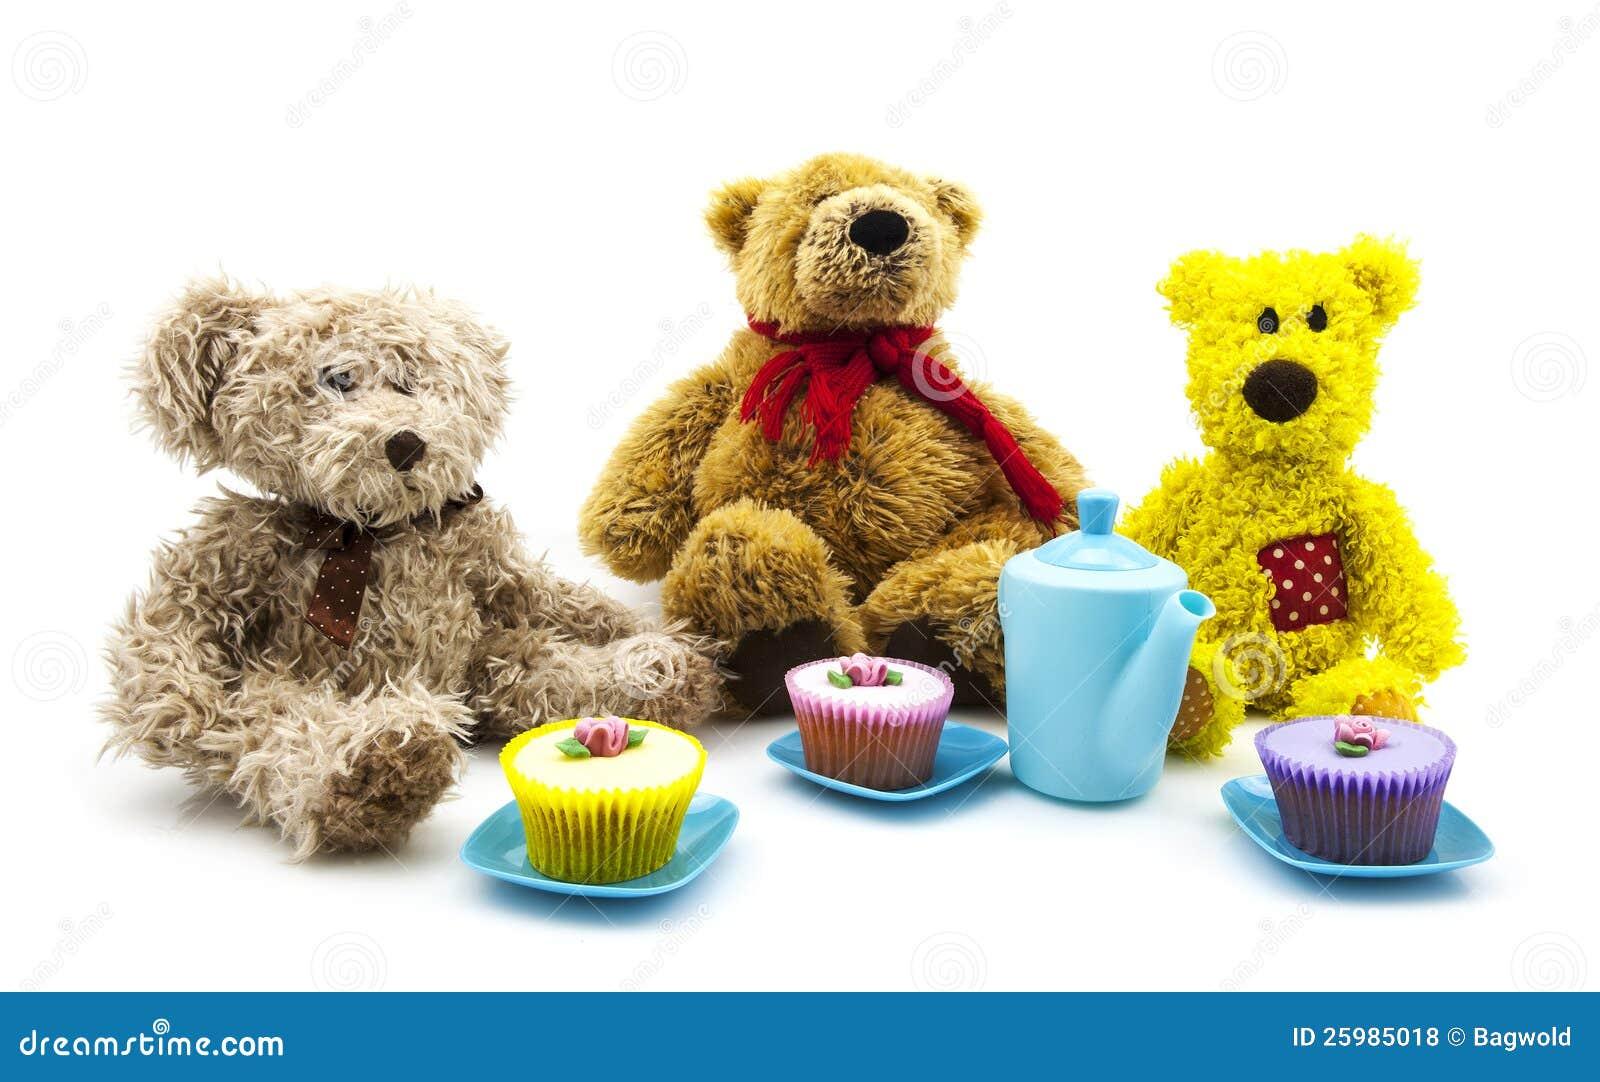 Round Cake With Teddy Bear Picnic Fondant